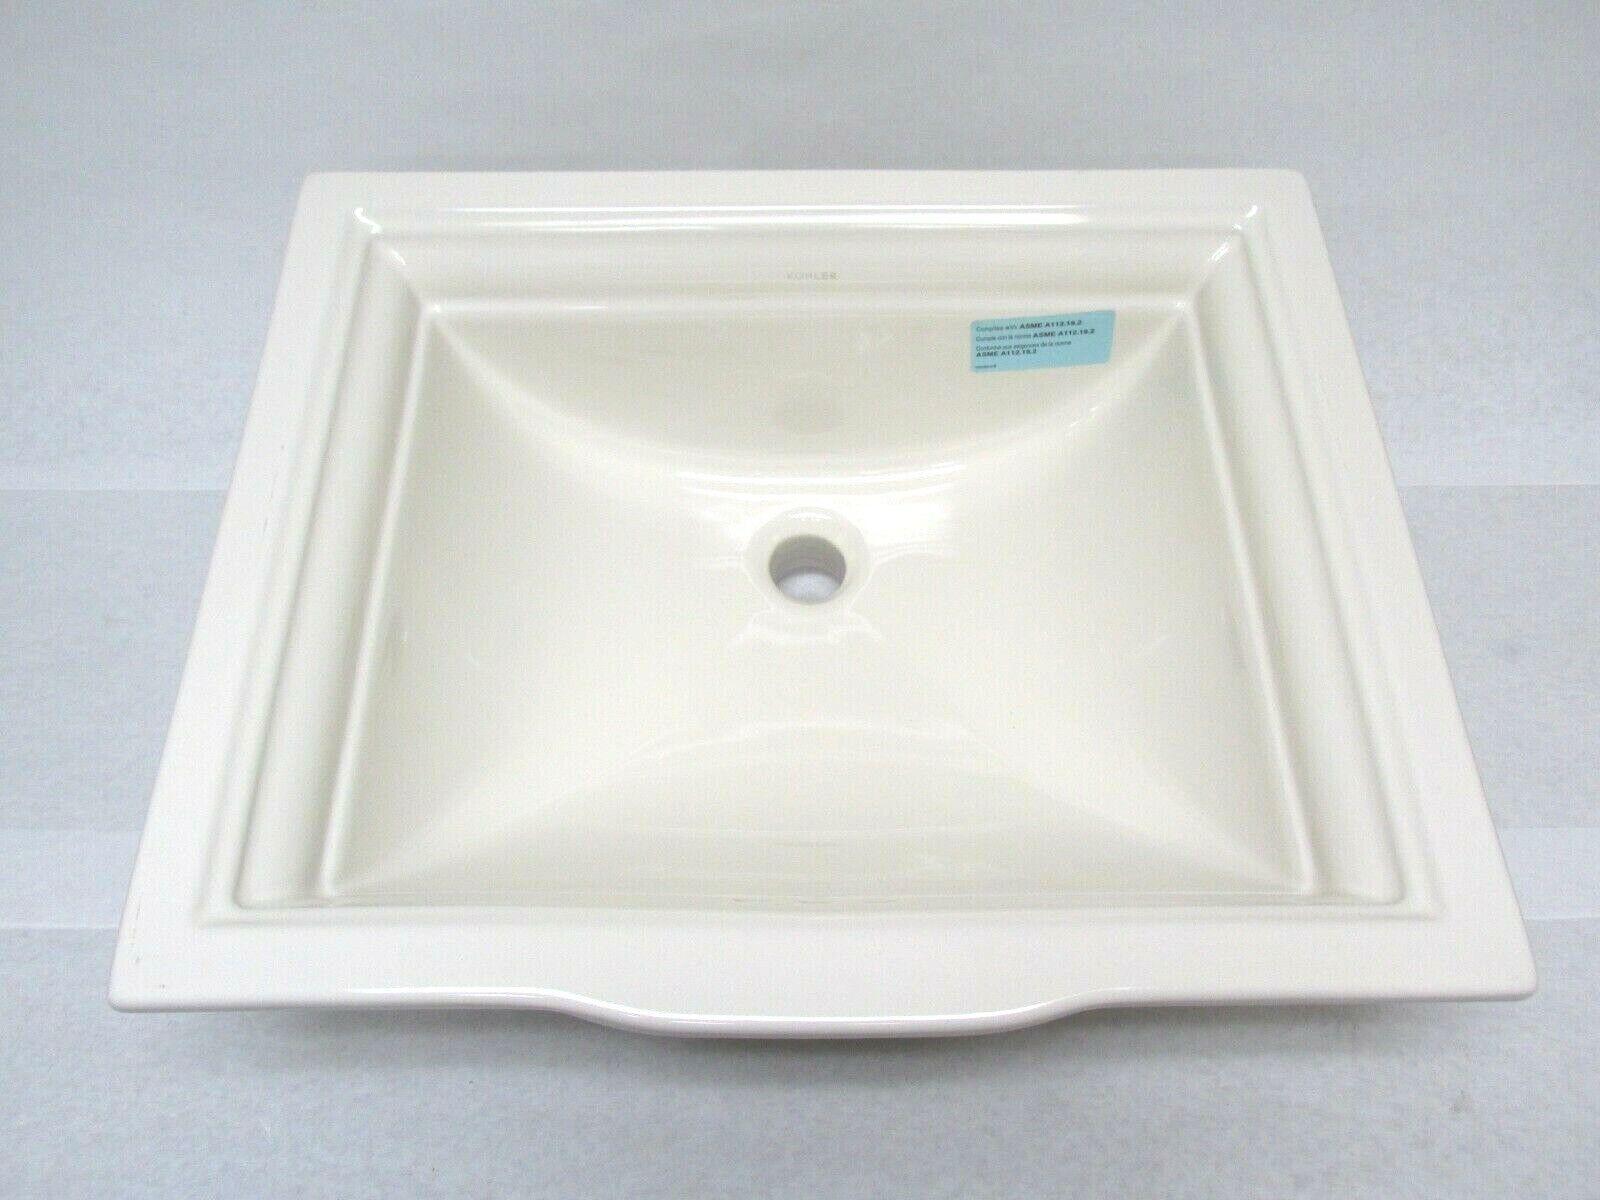 Kohler 2339-96 Memoirs Rectangular Undermount Bathroom Sink